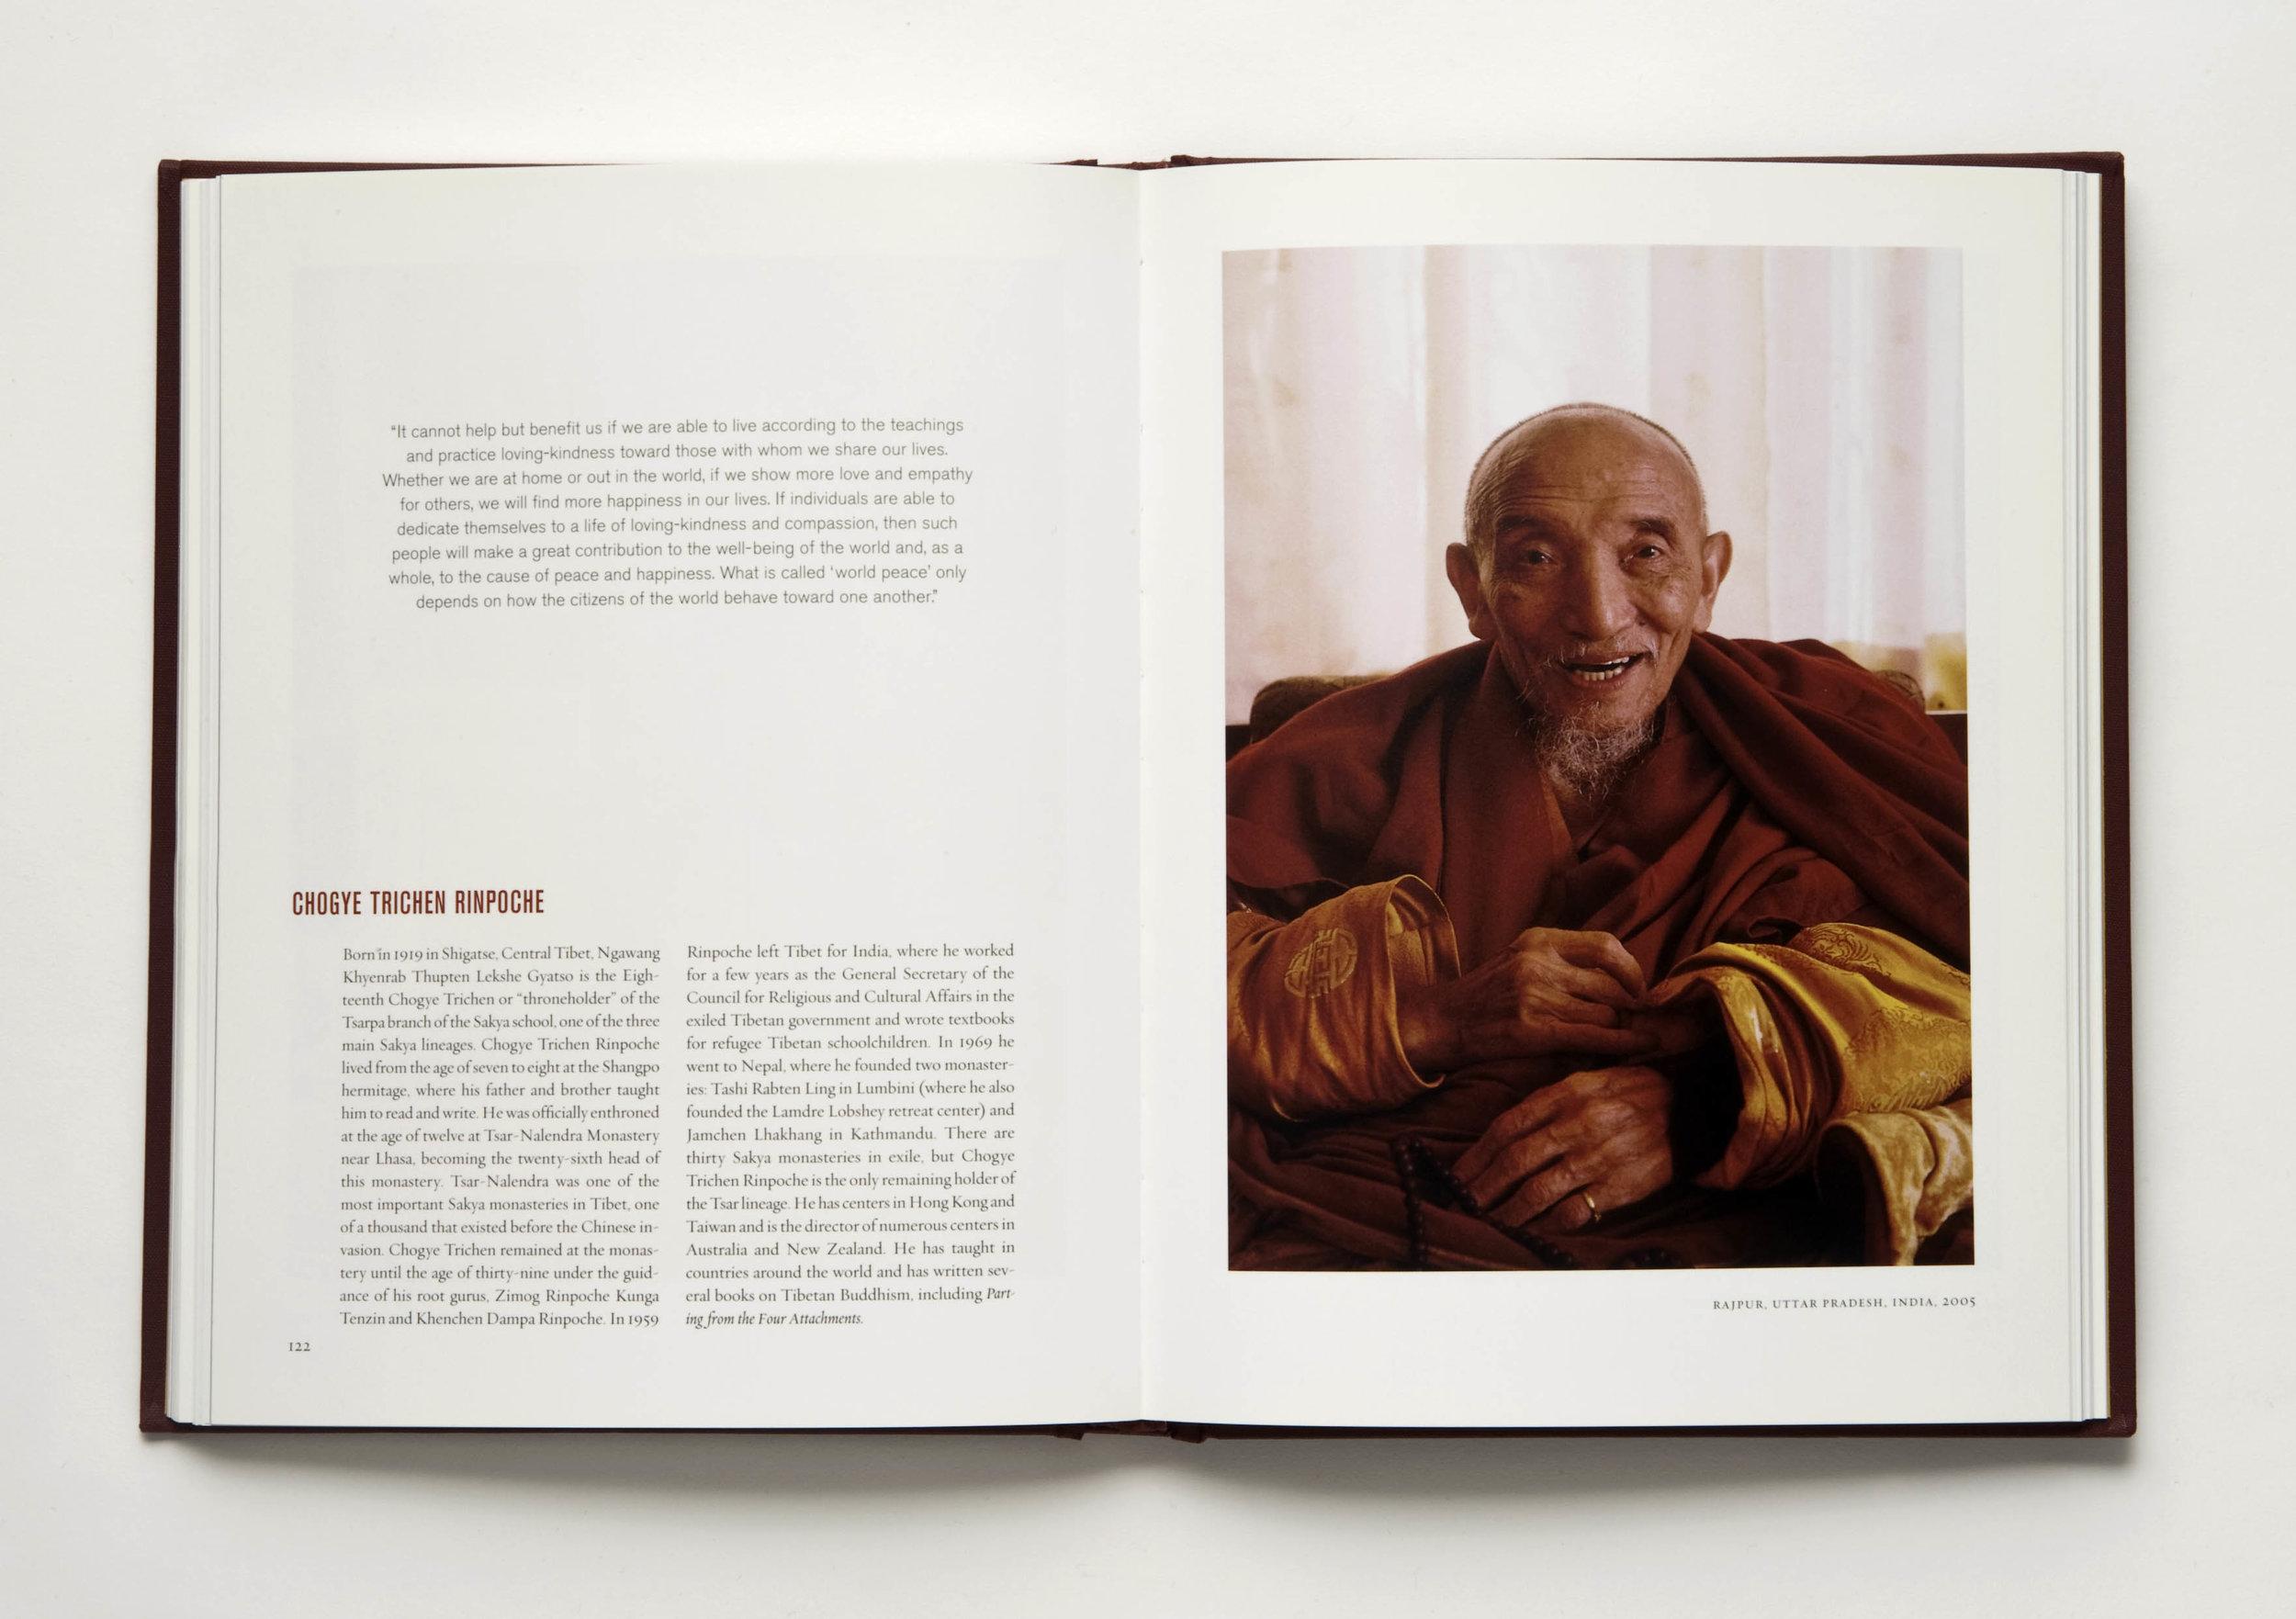 portraits-of-tibetan-buddhist-masters4.jpg